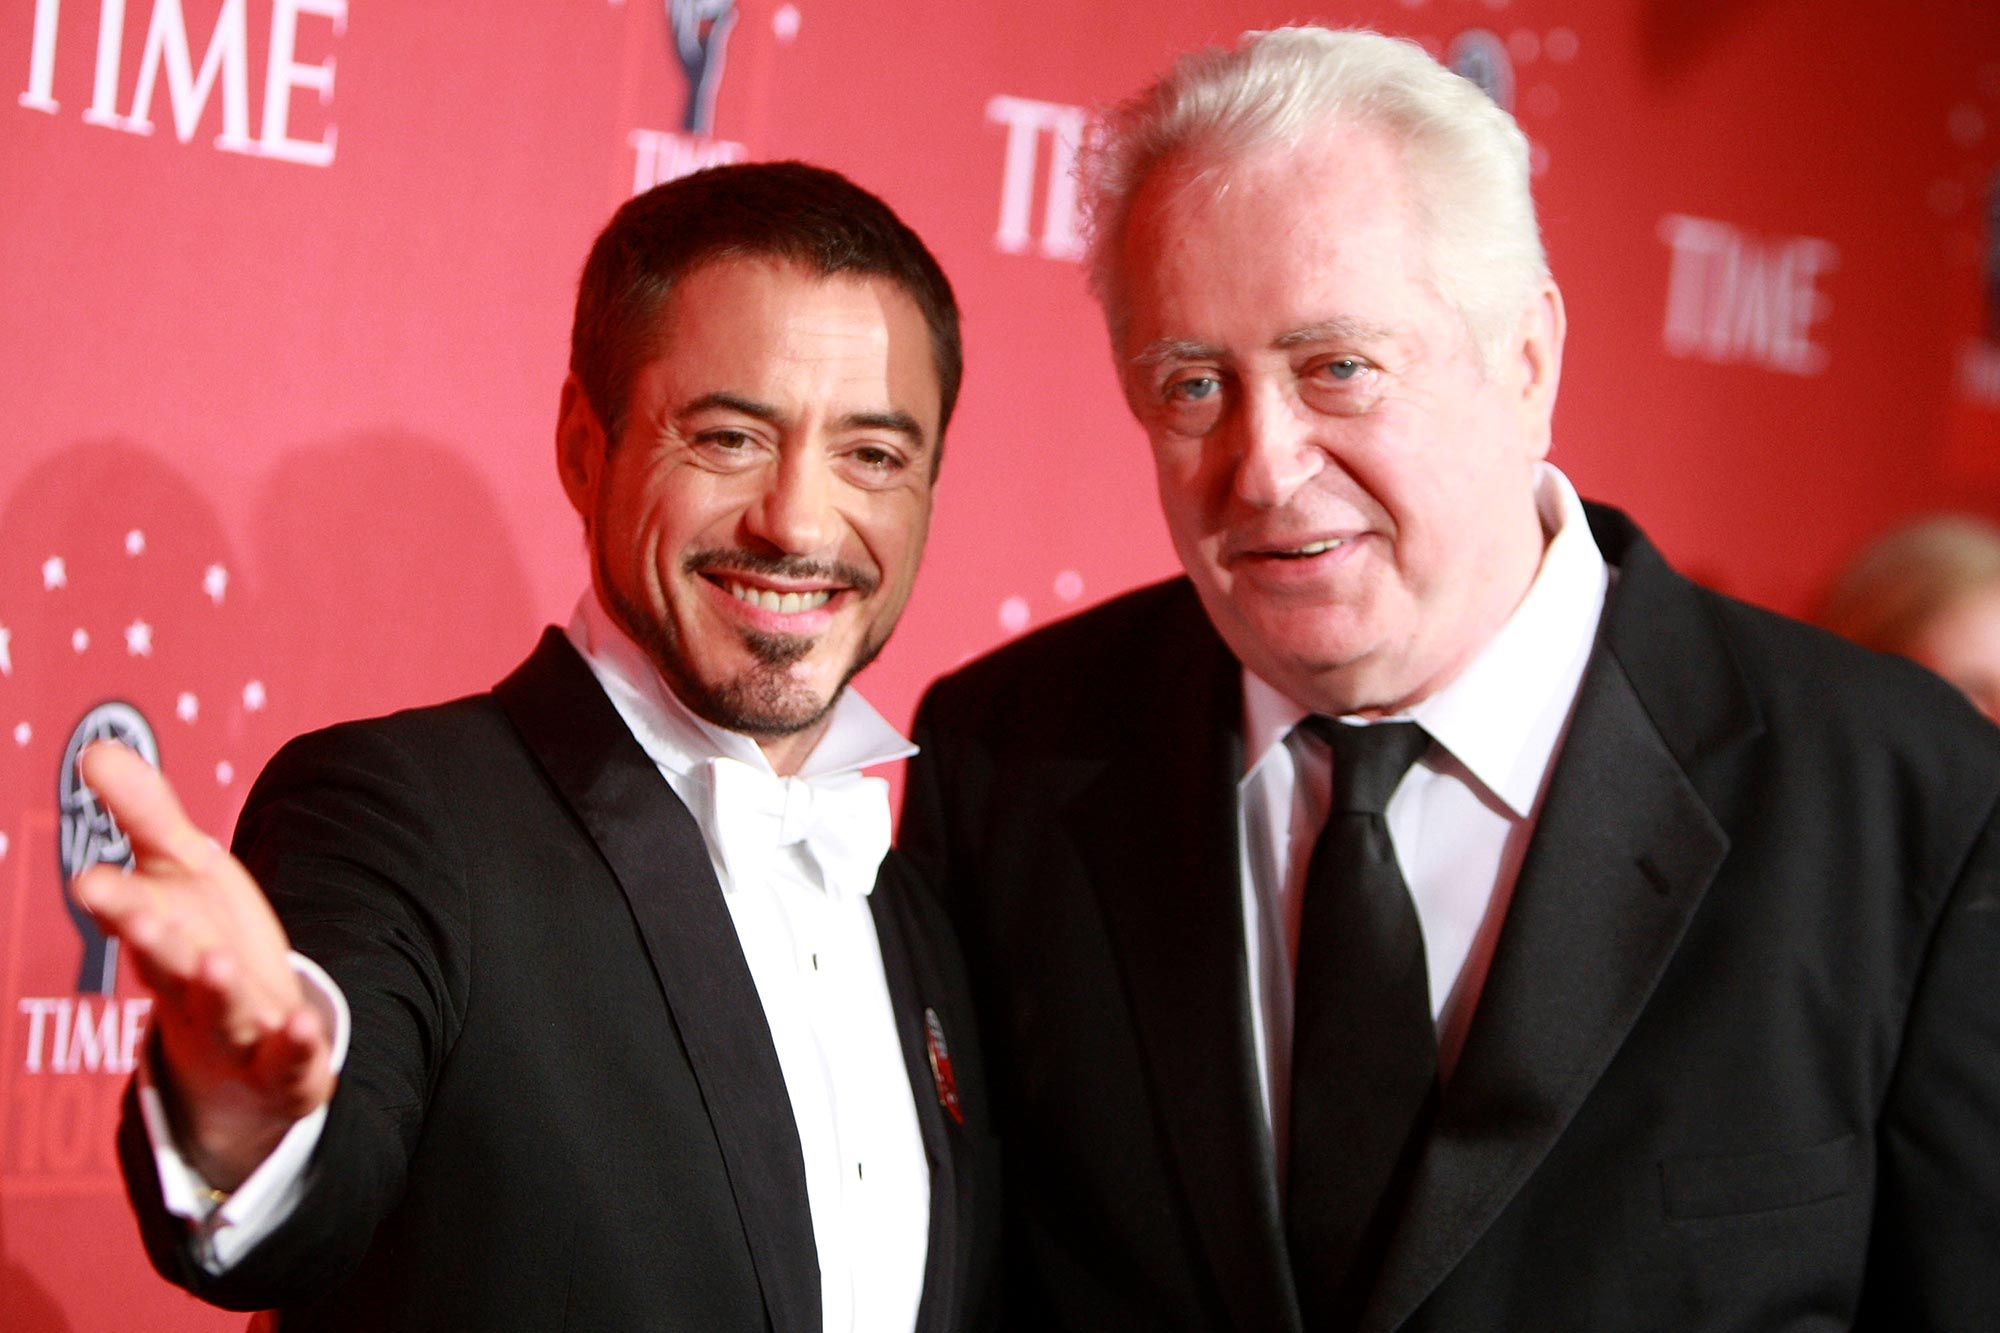 Robert Downey Jr. and father Robert Downey Sr.